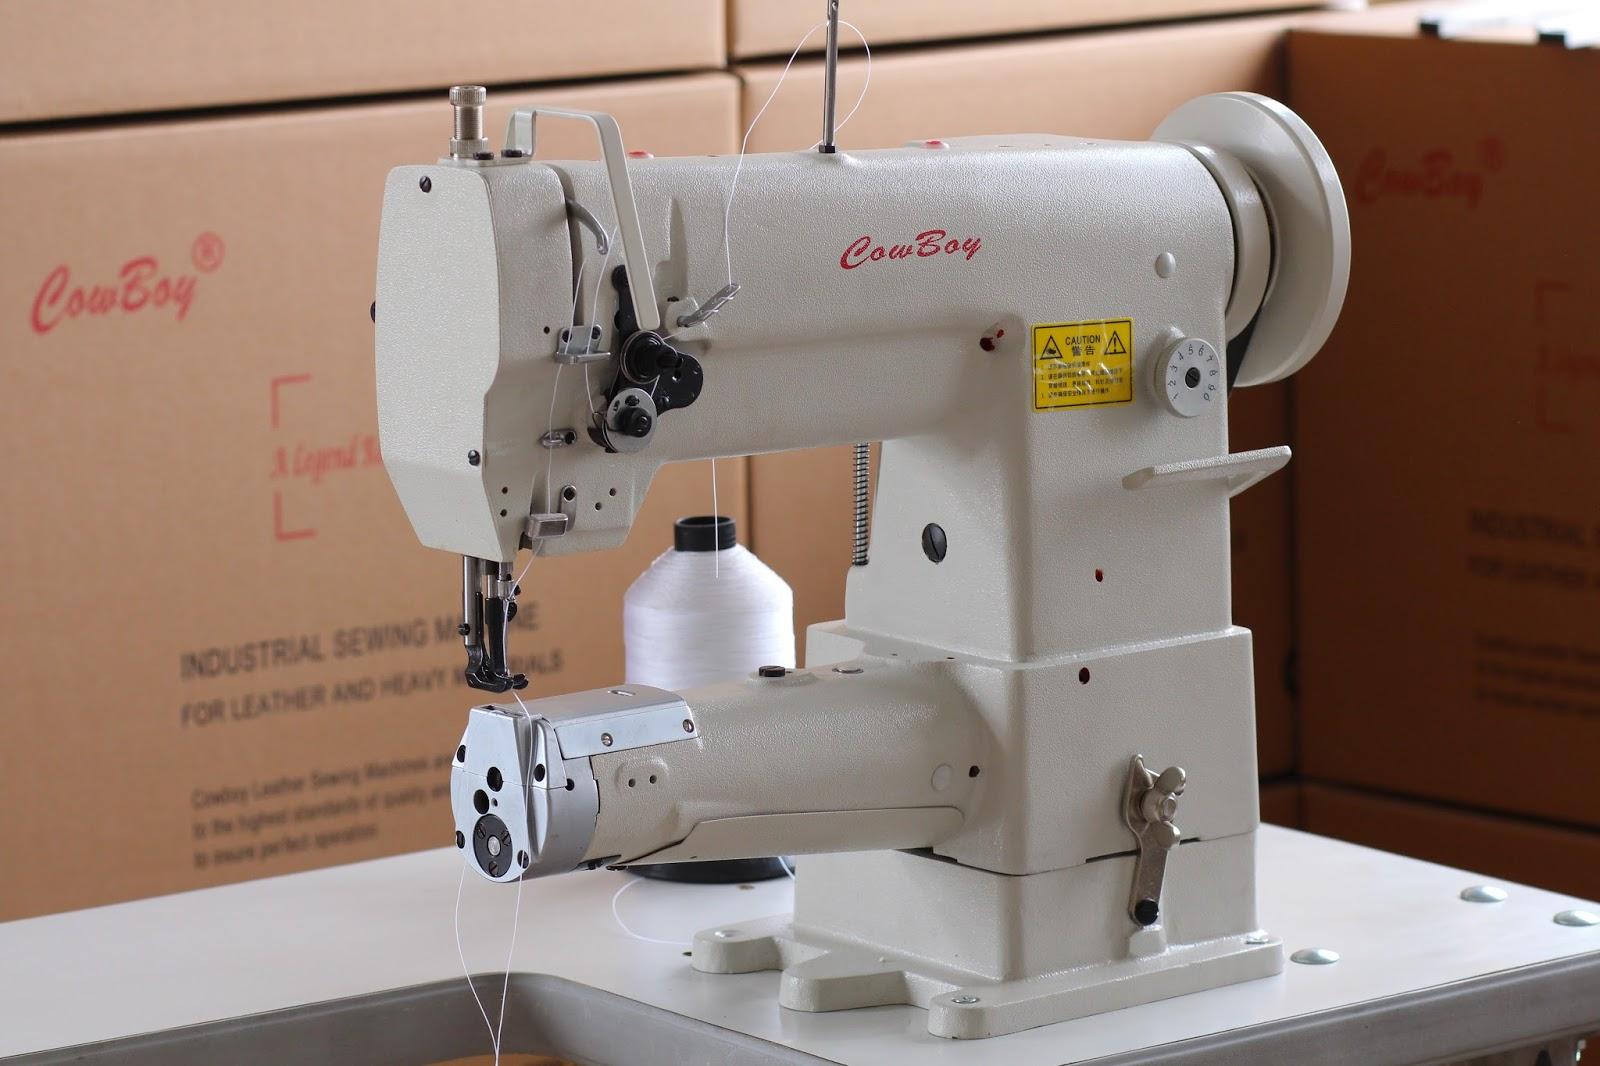 medium arm sewing machine